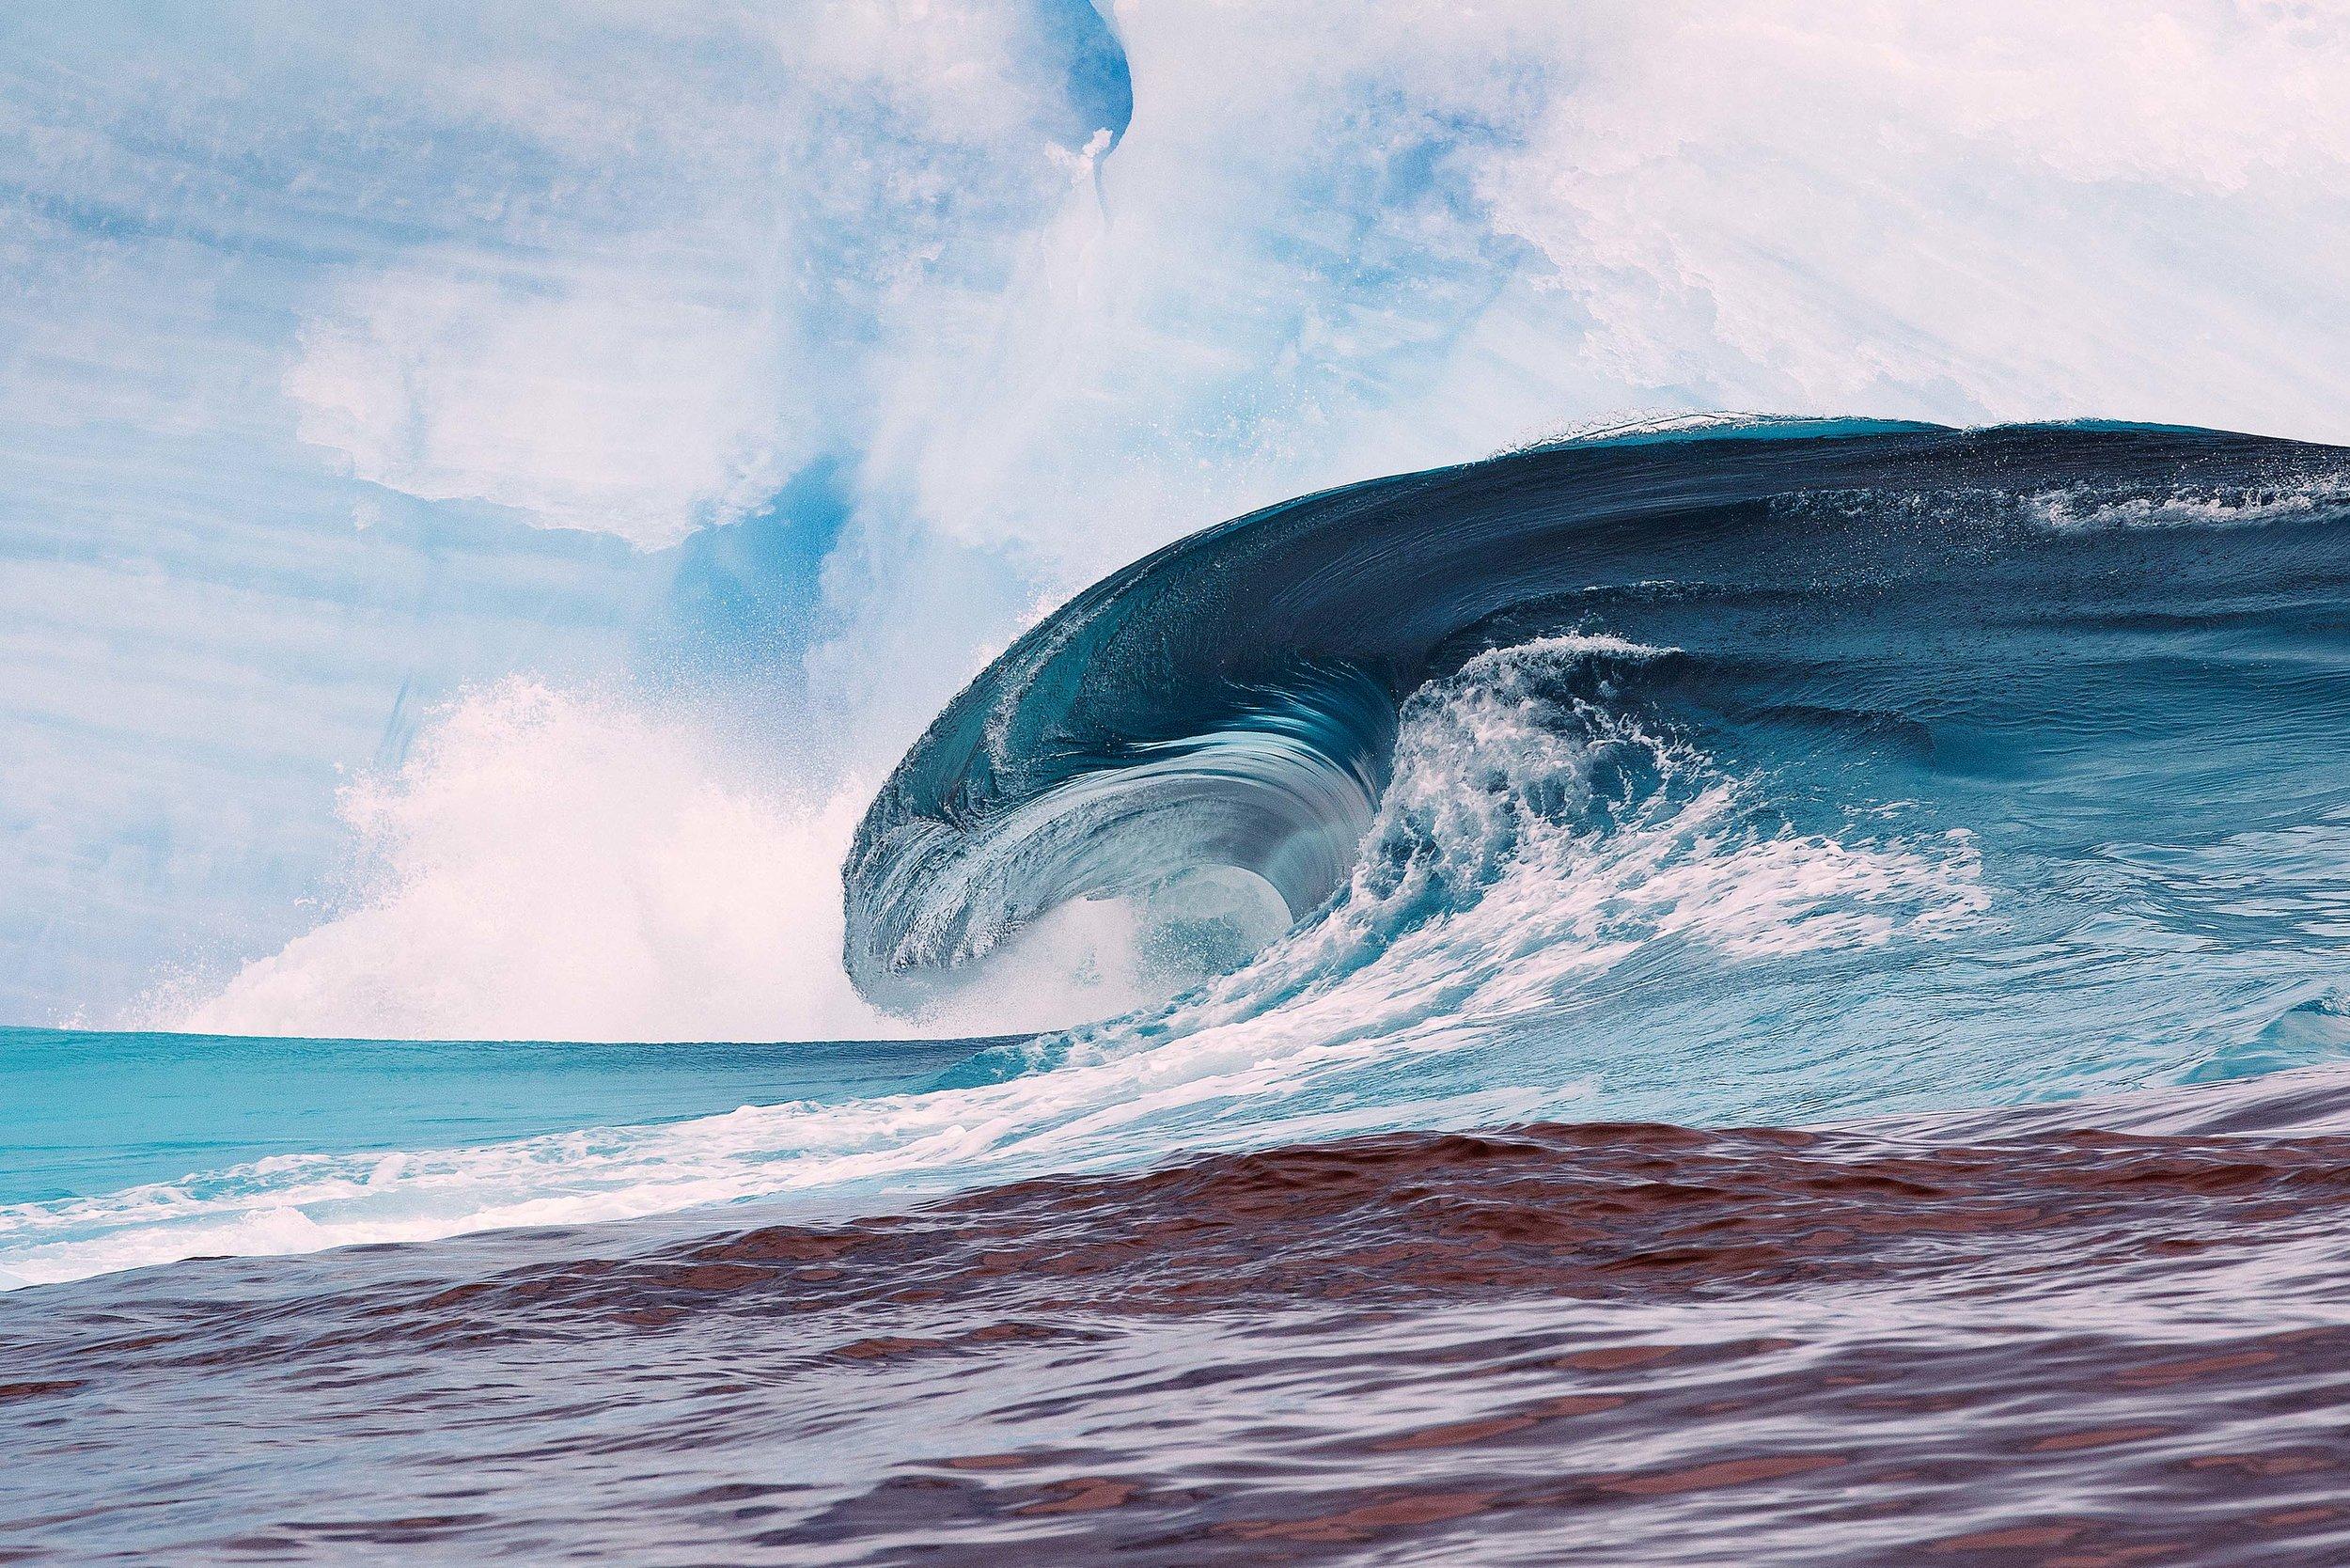 Wave, Antarctica-Lucia Griggi.jpg